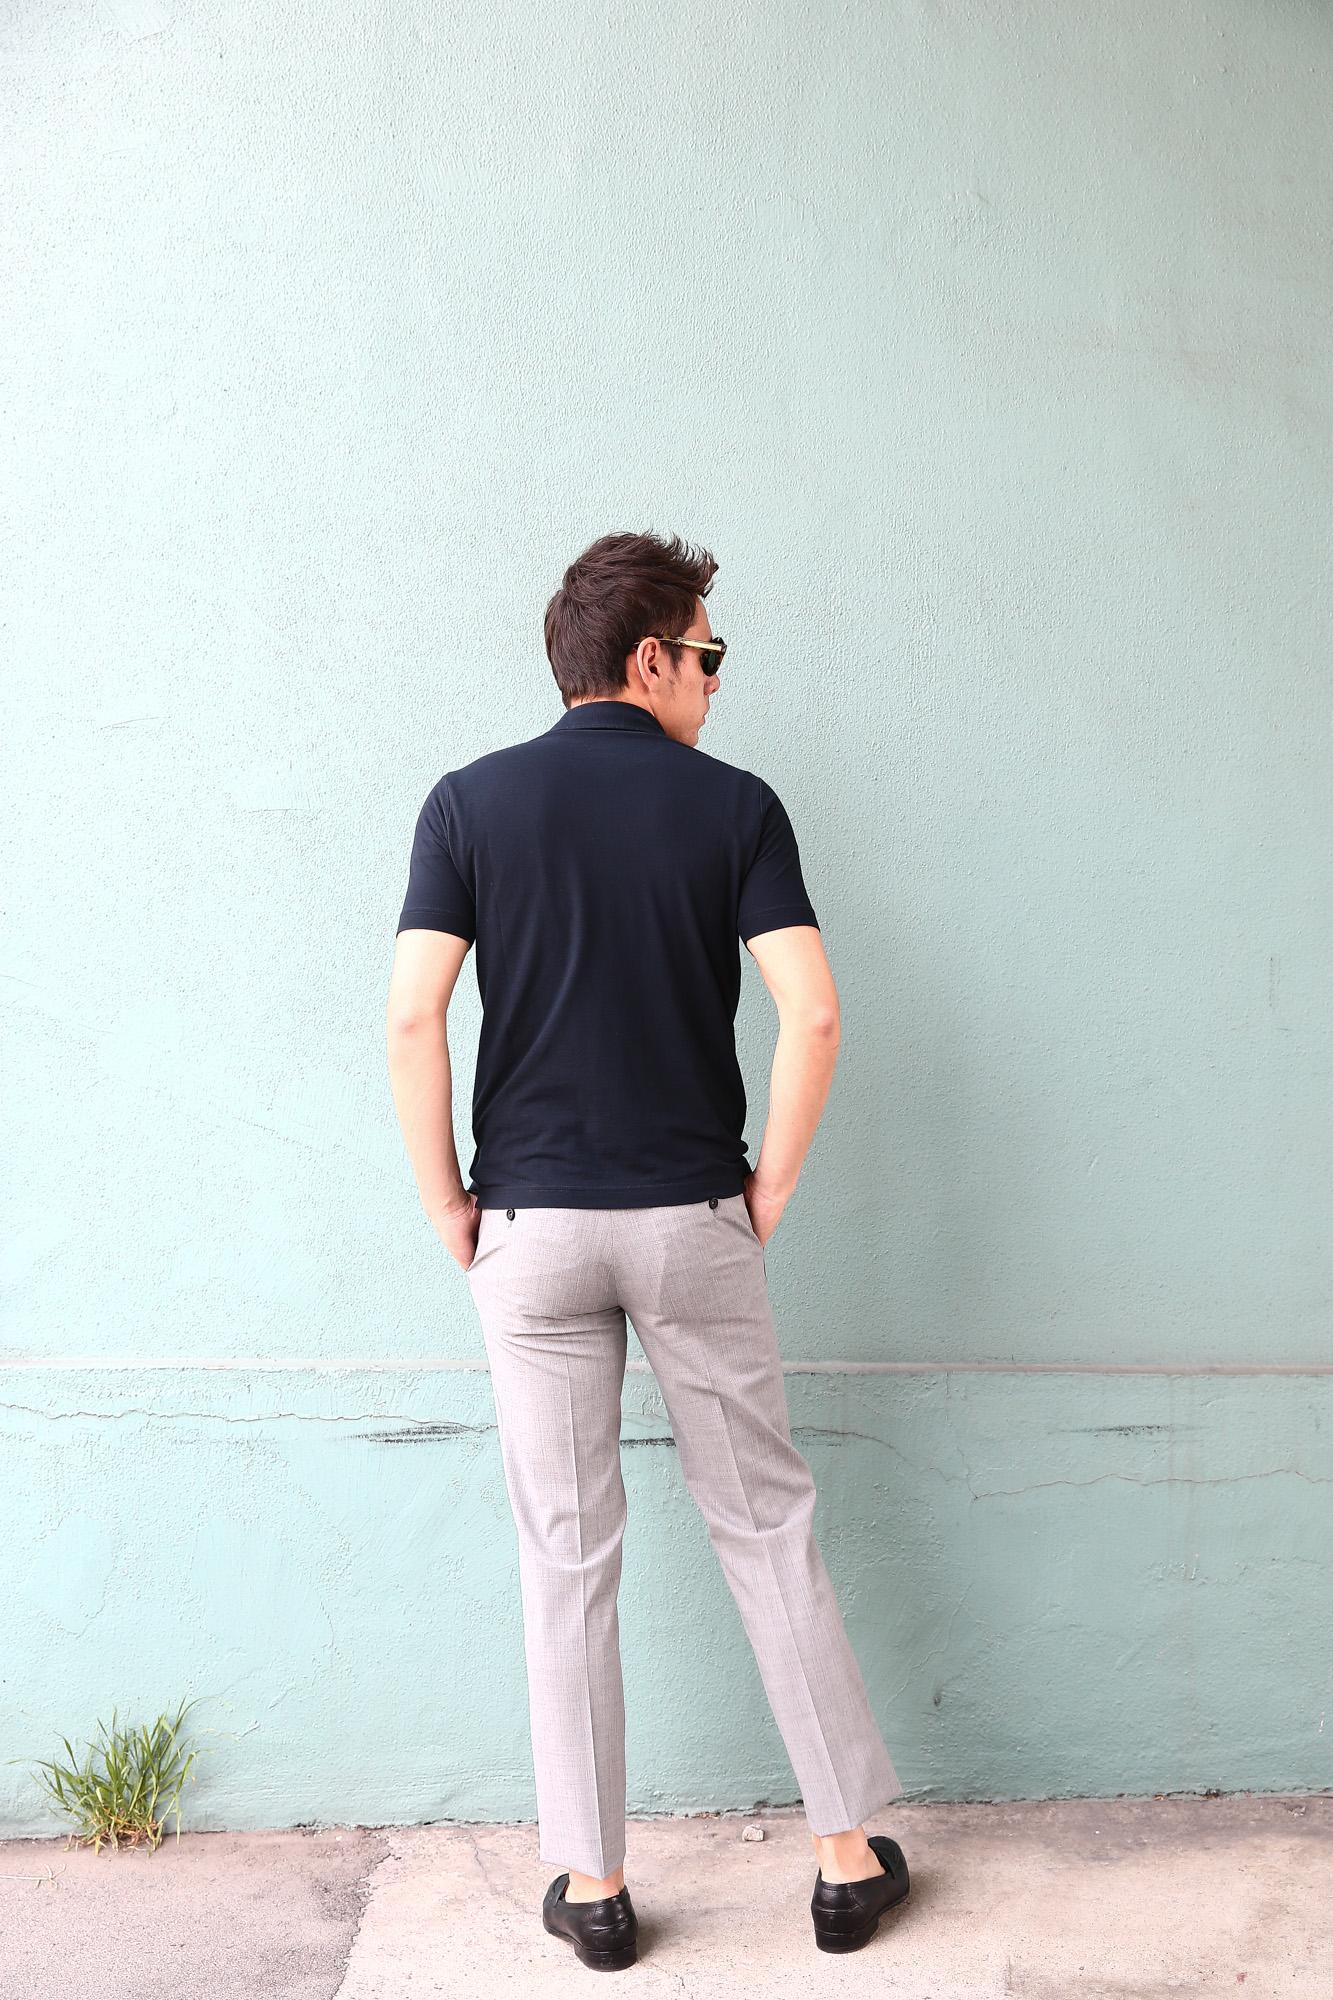 ZANONE (ザノーネ) Polo Shirt ice cotton アイスコットン ポロシャツ NAVY (ネイビー・Z0542) made in italy (イタリア製) 2018 春夏新作 愛知 名古屋 Alto e Diritto アルト エ デリット ポロ ニットポロ